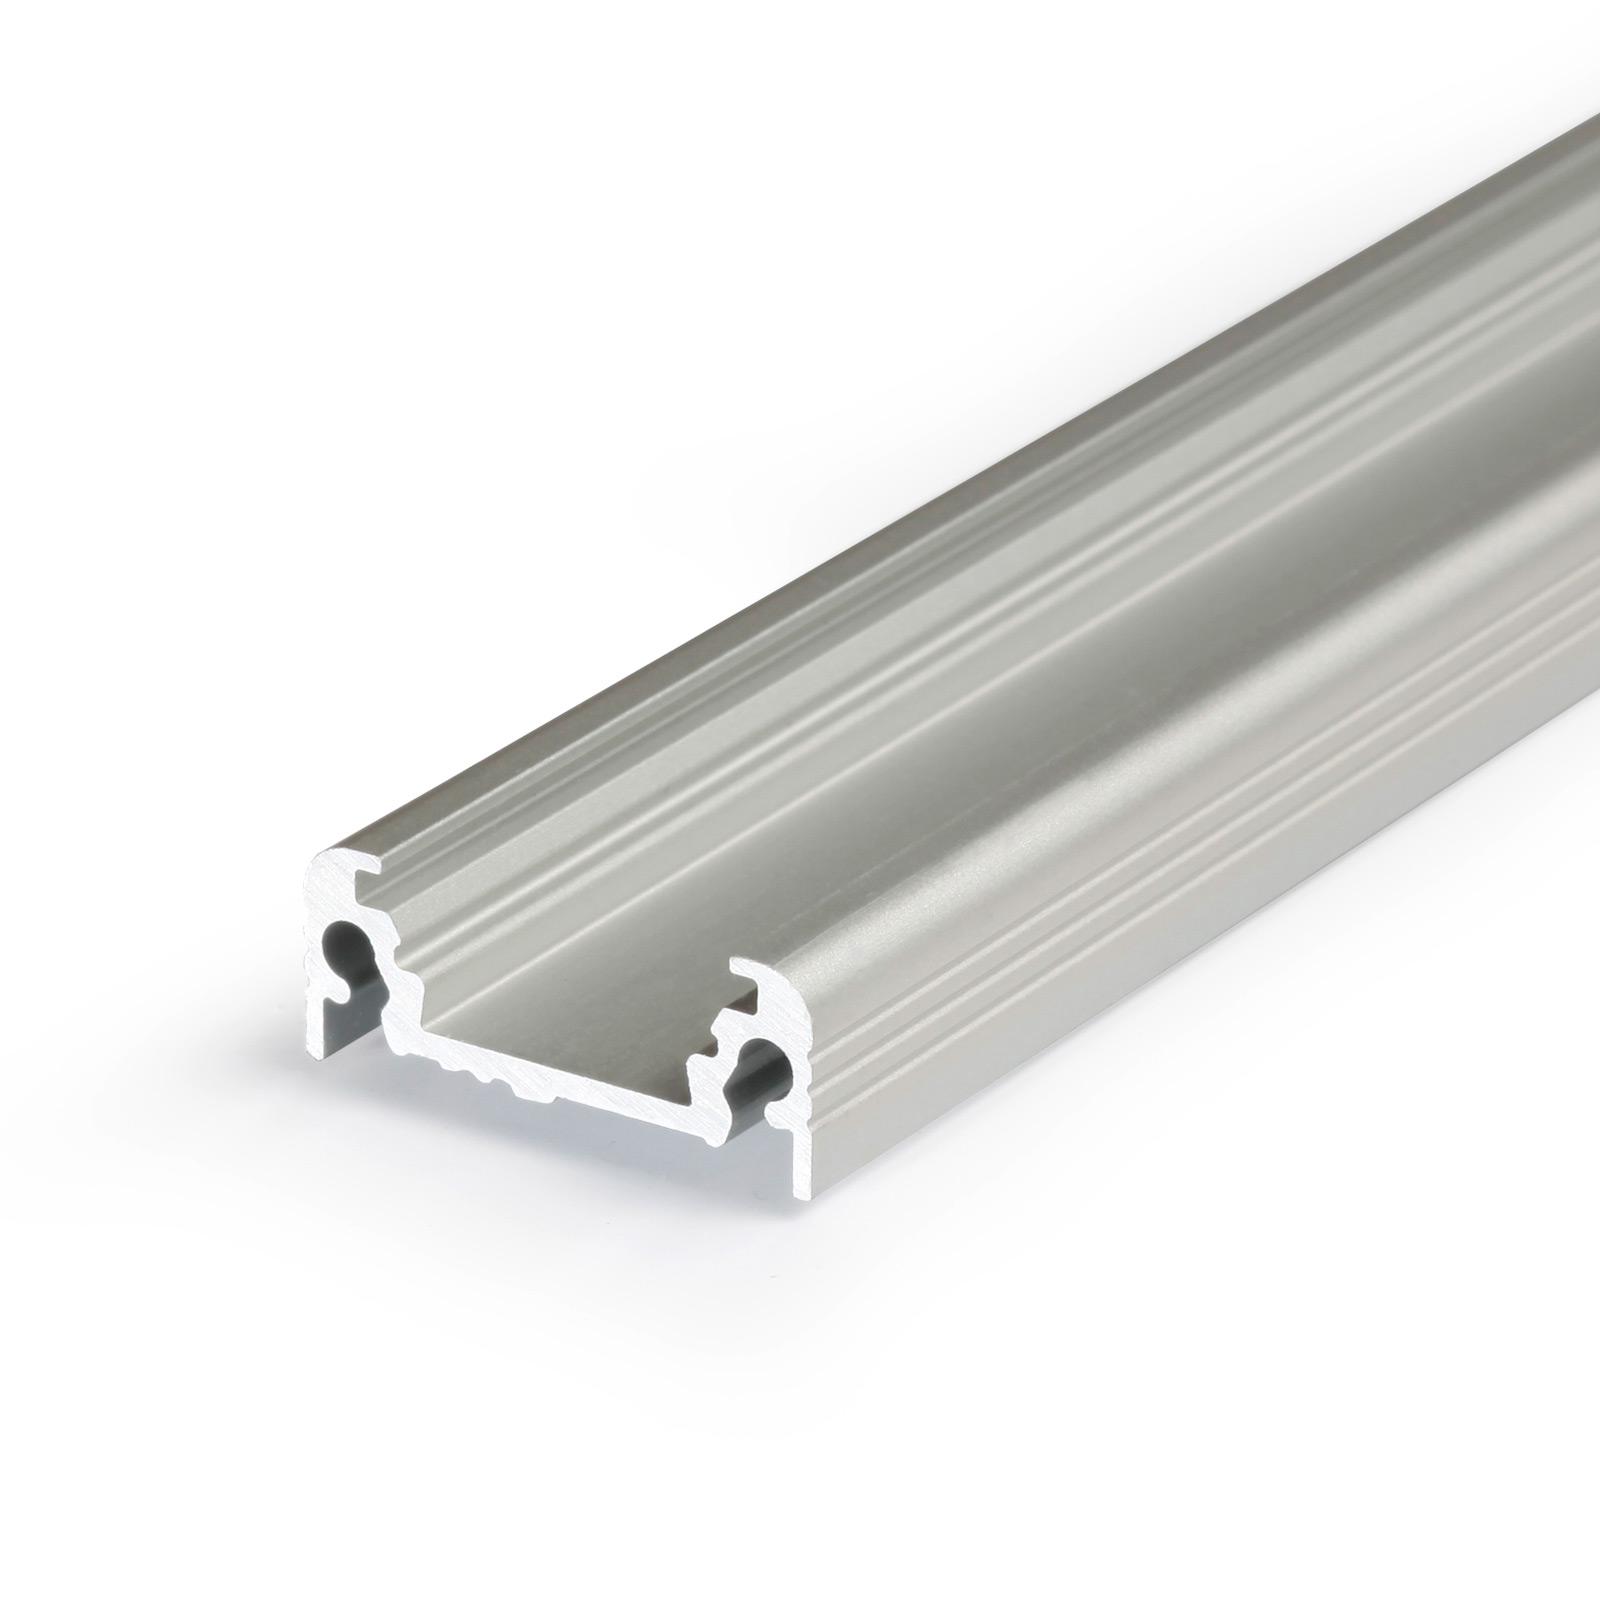 1-2 Meter LED Aufbauprofil SURFACE (SU) - U-Profil